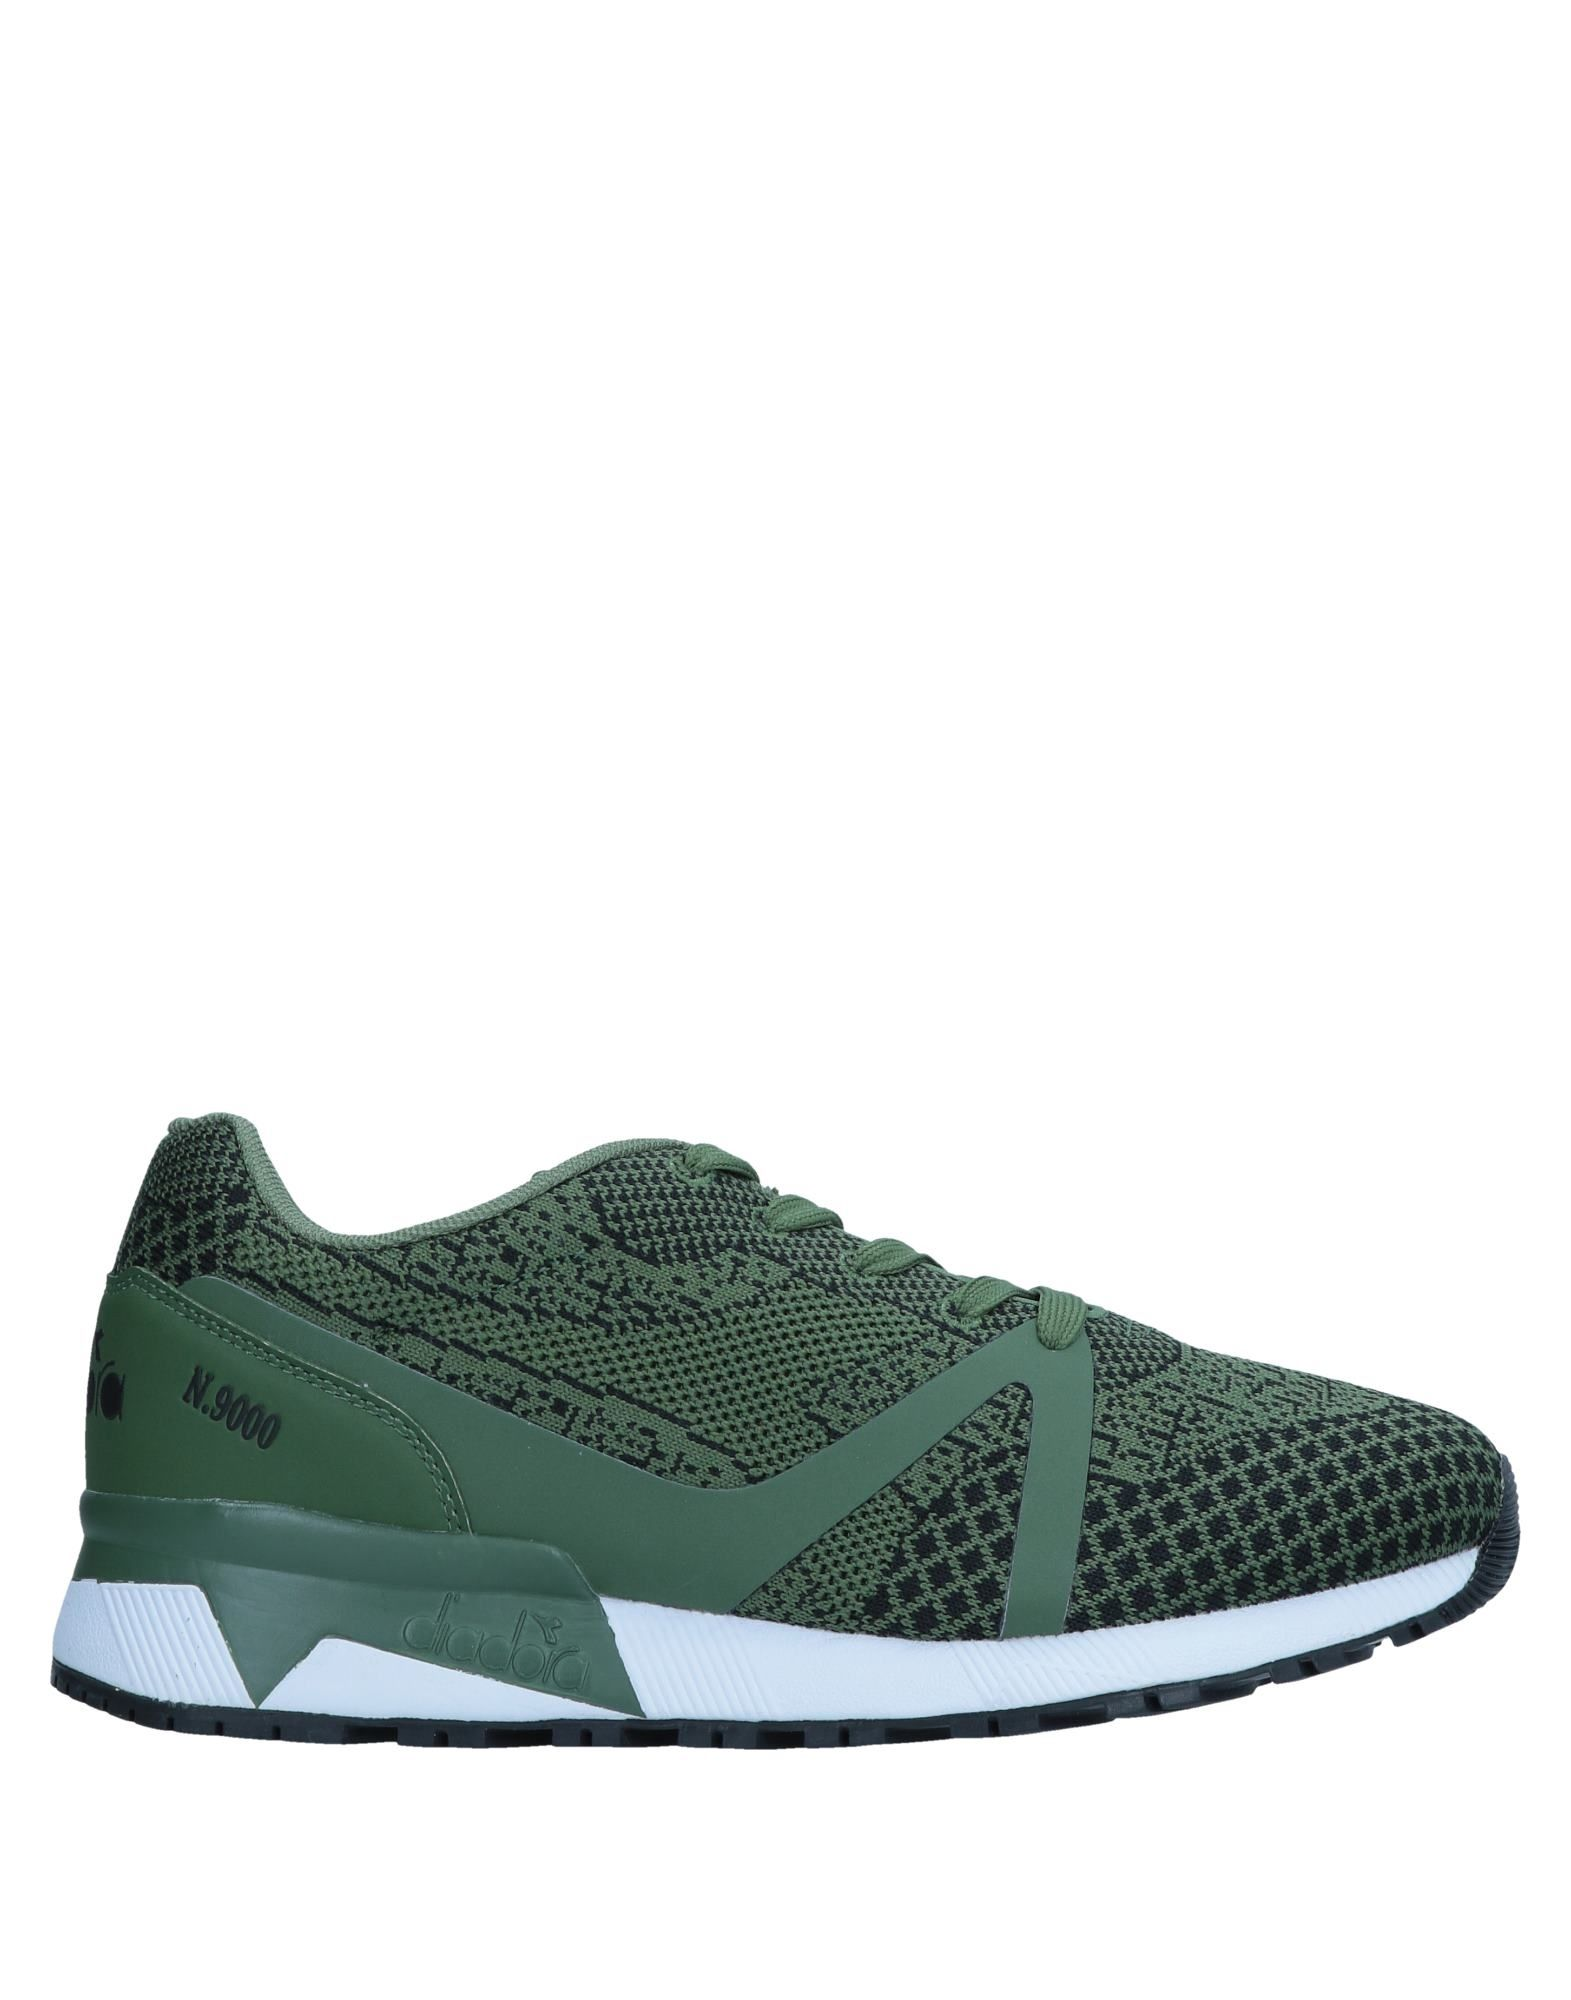 Rabatt echte Schuhe Schuhe Schuhe Diadora Sneakers Herren  11545643CG be9b5b